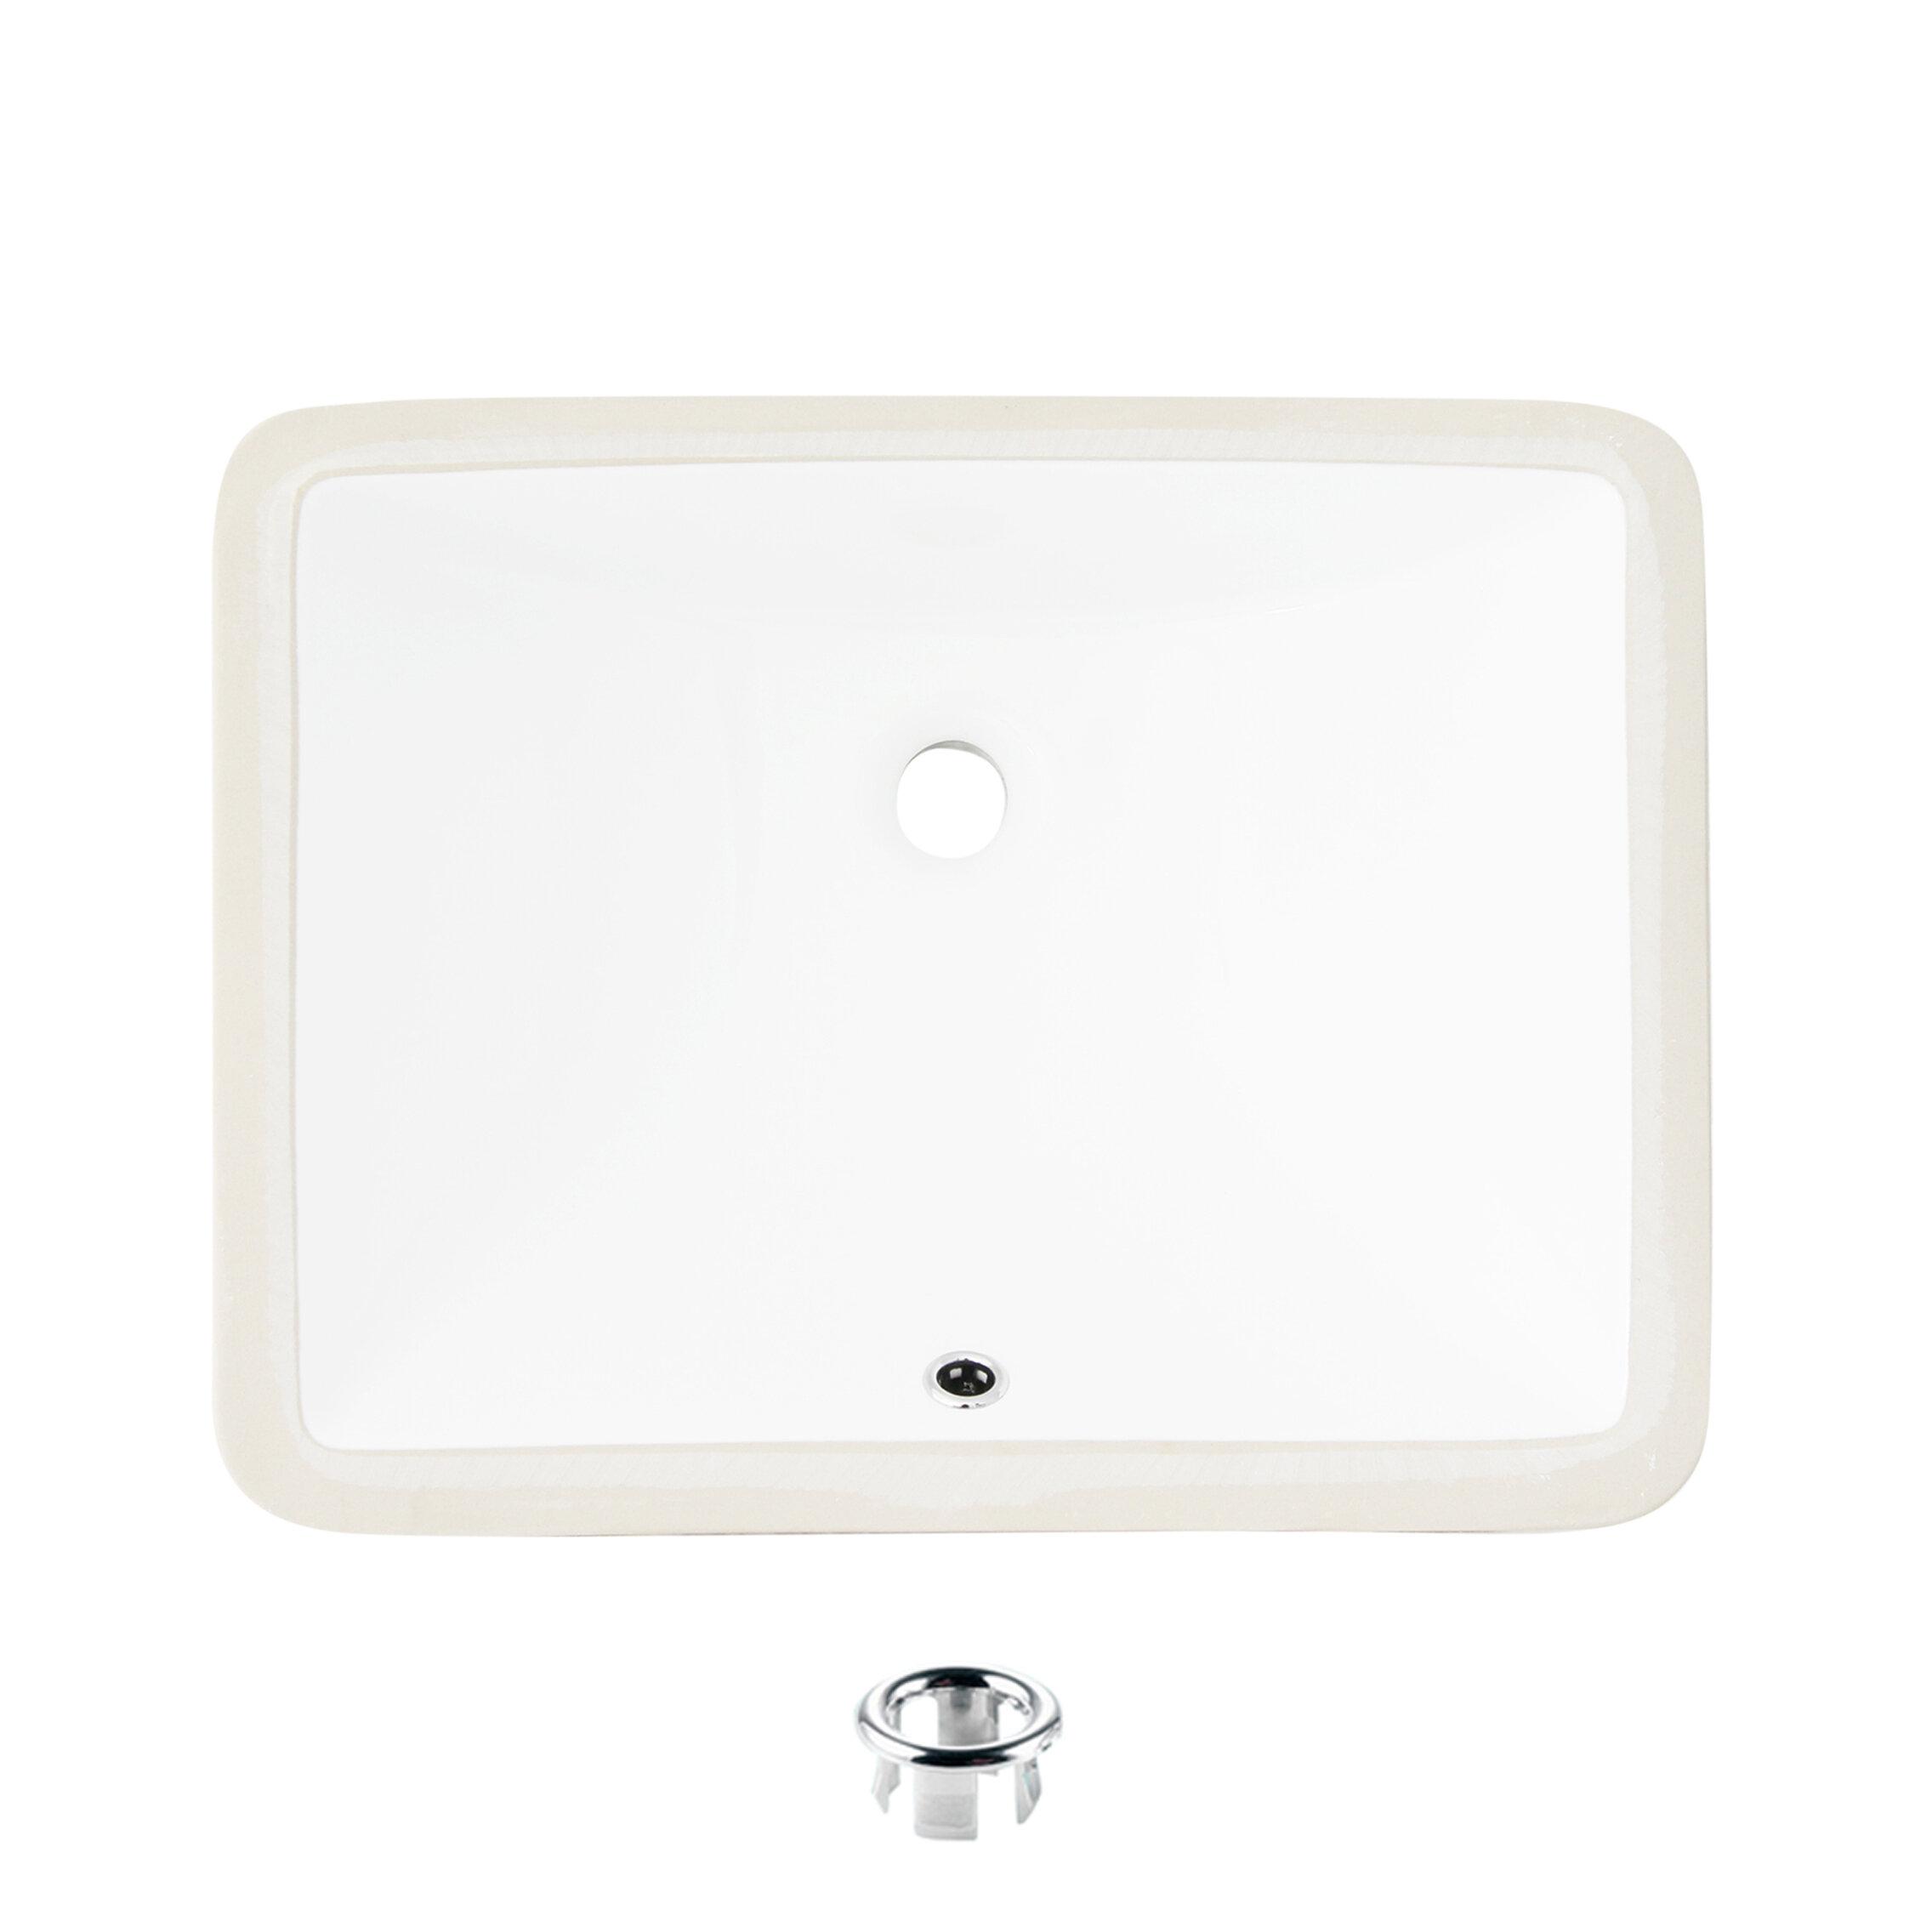 Stylish White Ceramic Rectangular Undermount Bathroom Sink With Overflow Reviews Wayfair